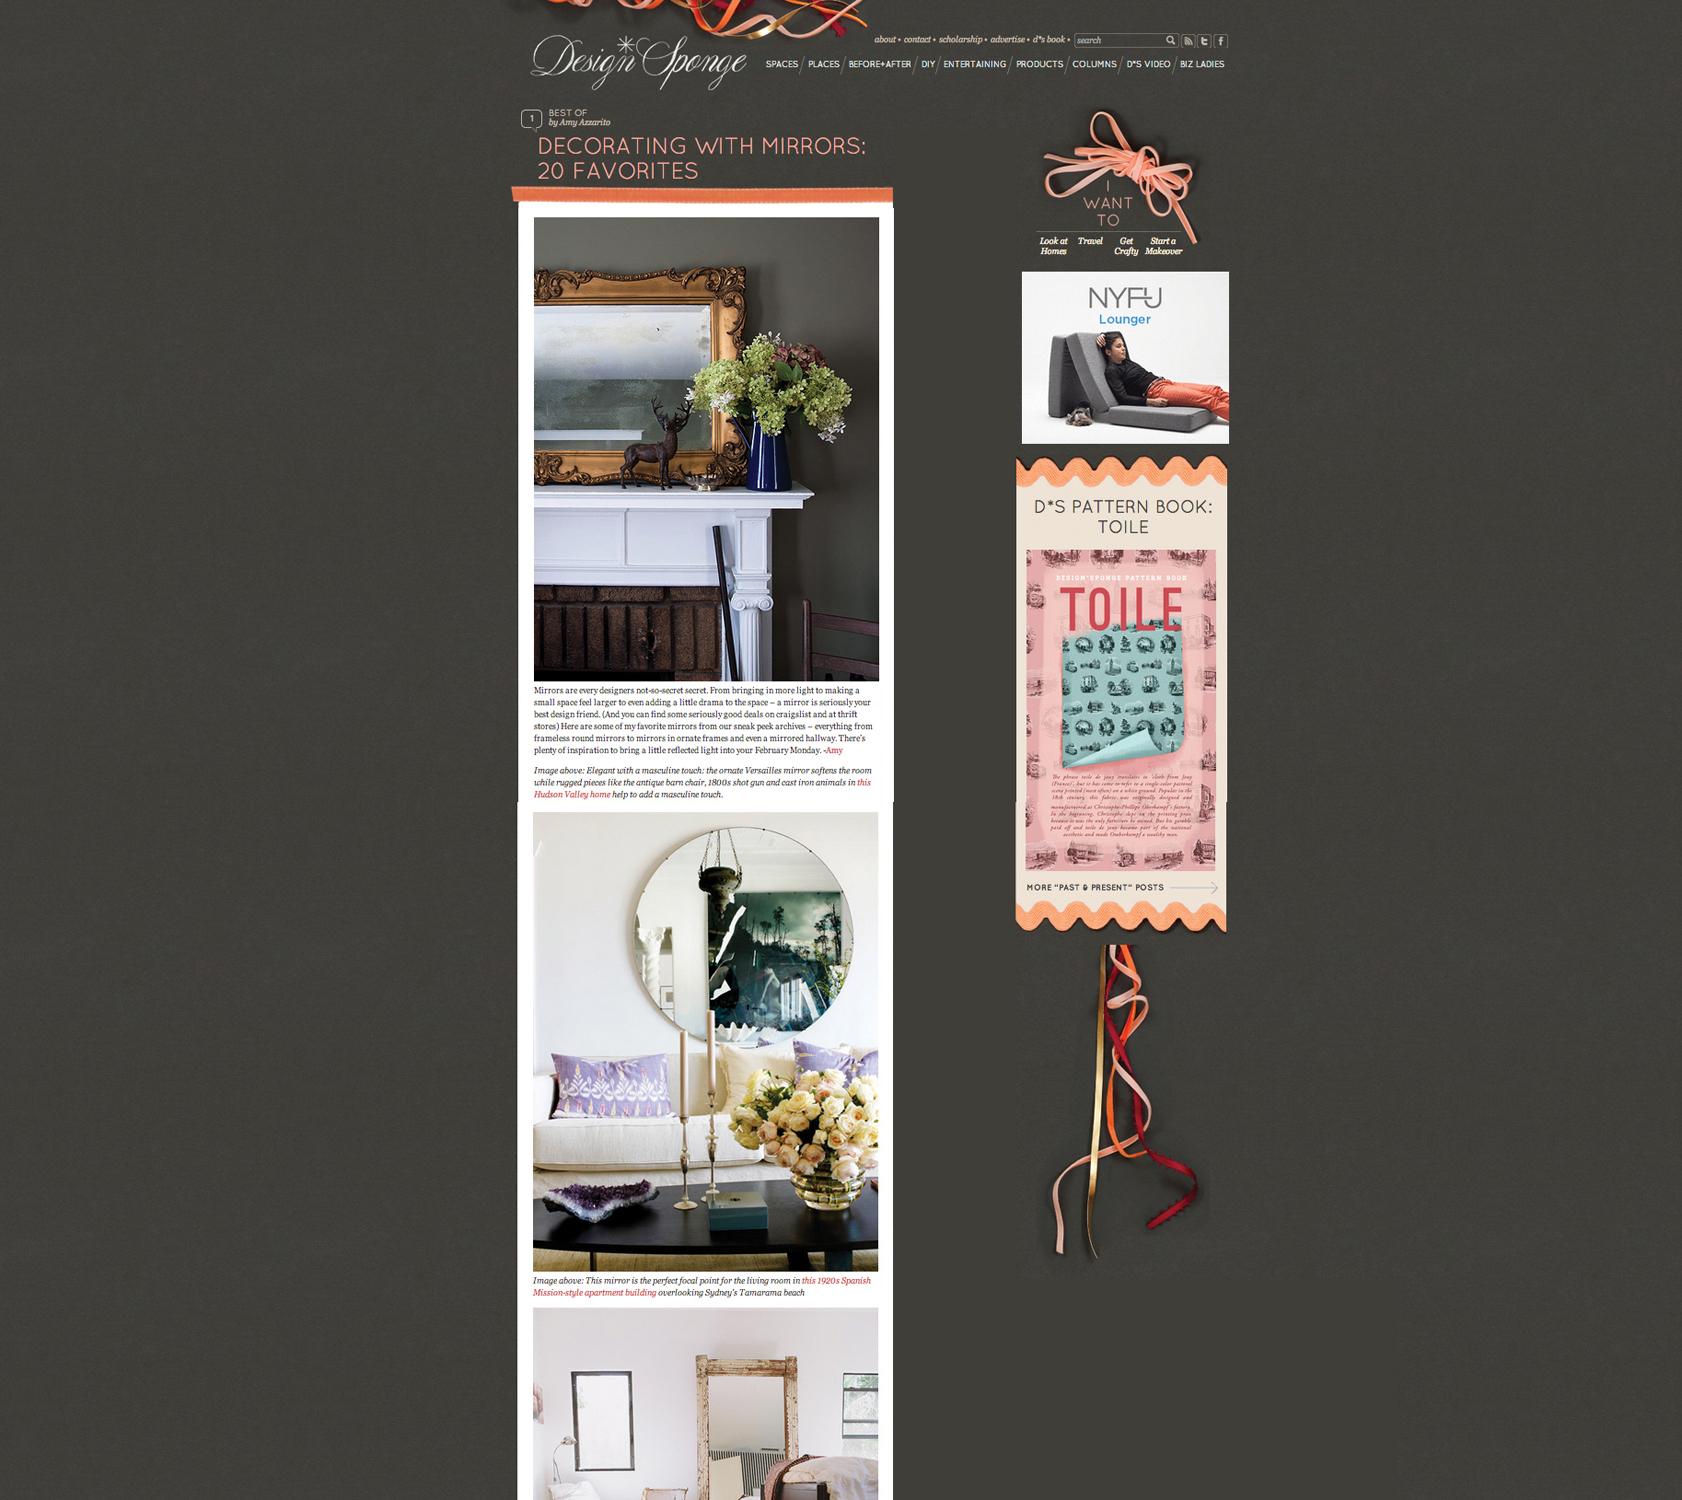 design-sponge-decorating-with-mirrors.jpg